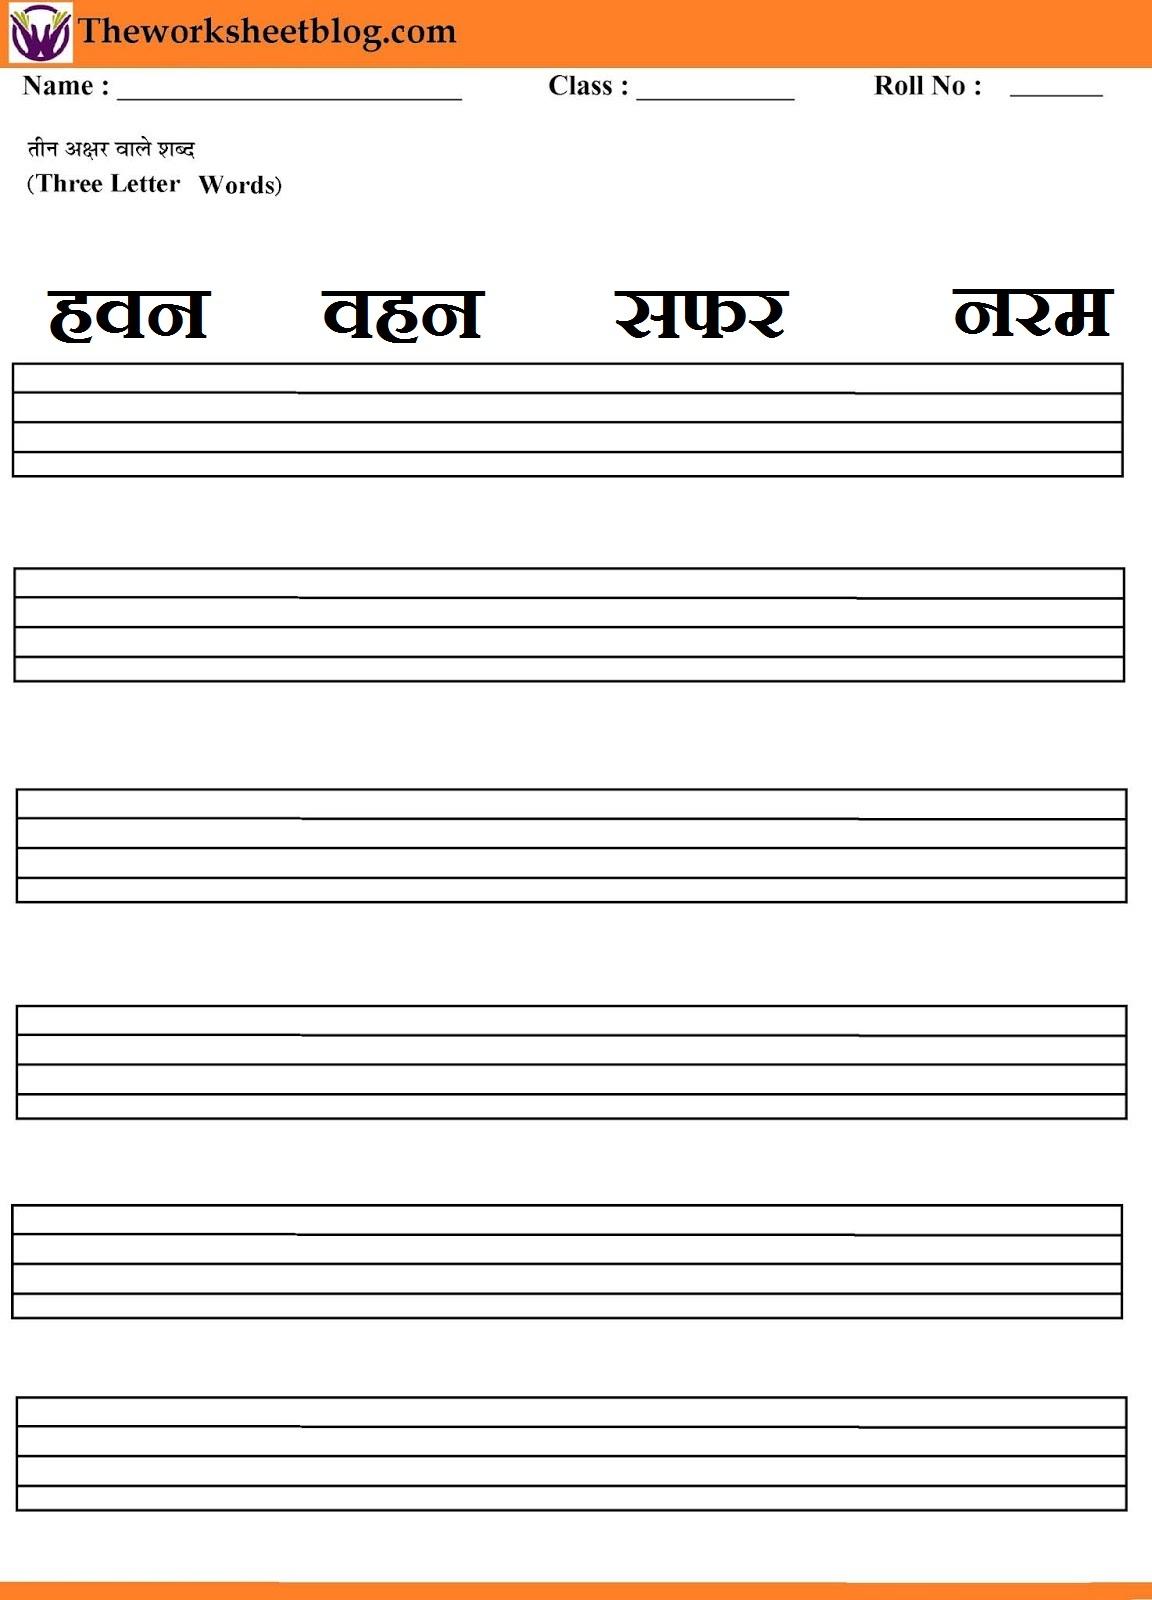 Three Letter Words Worksheet In Hindi